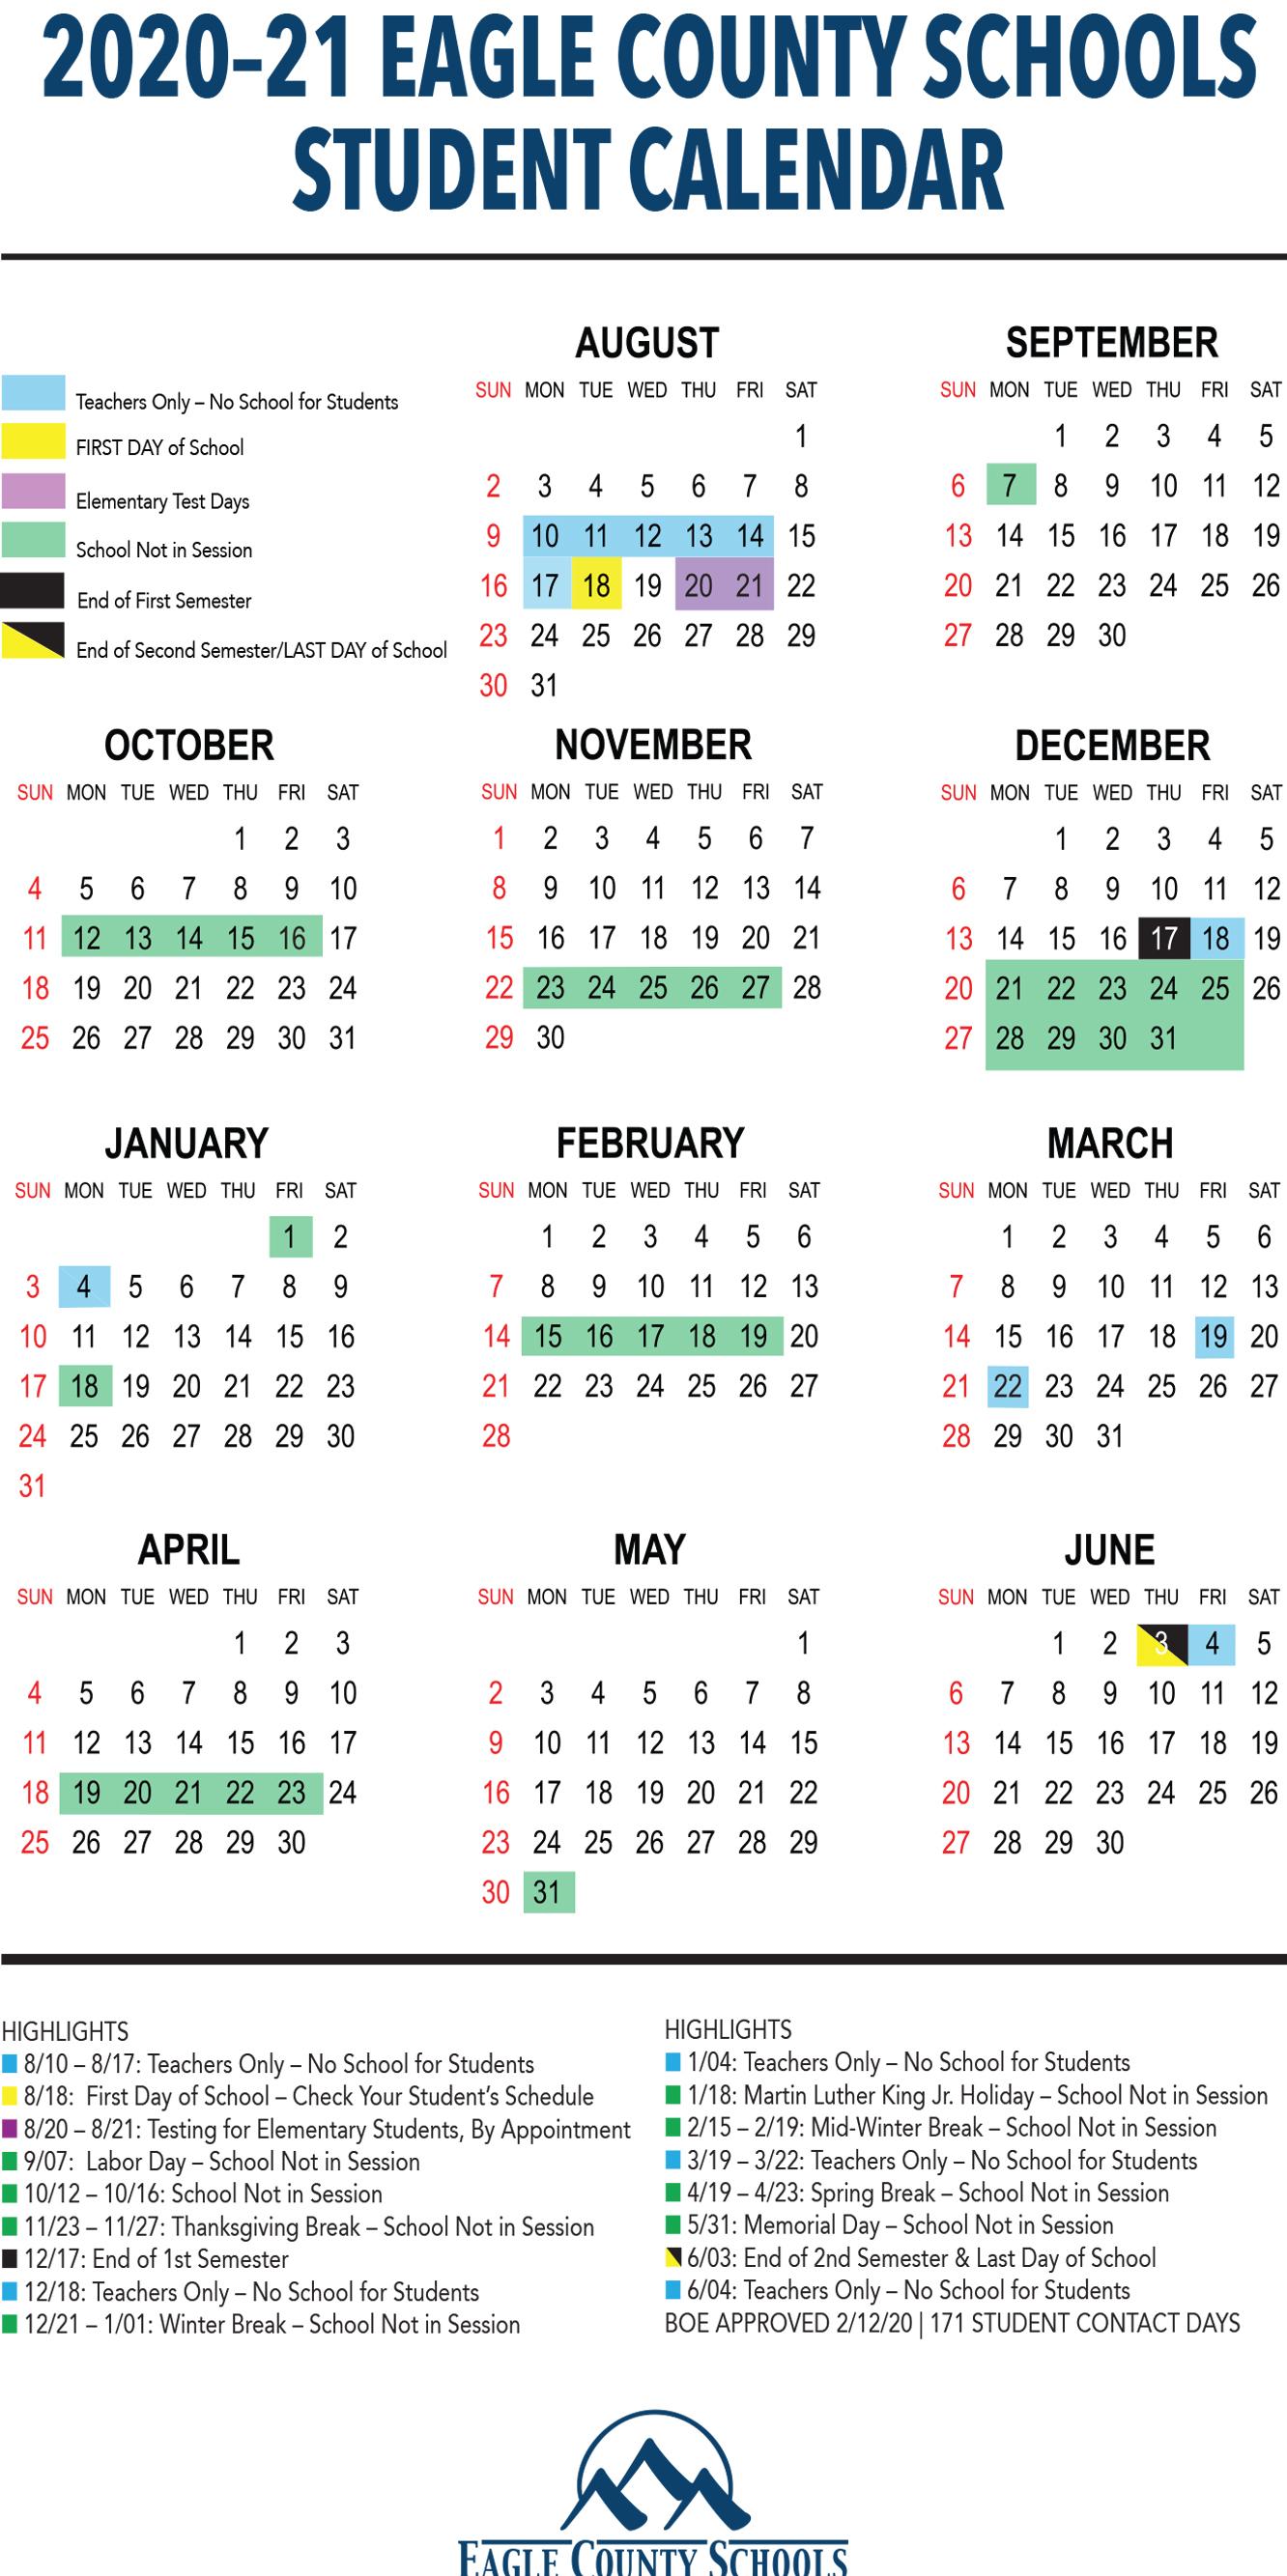 School Calendars | Eagle County Schools Inside Davidson County Tn School Calendar20